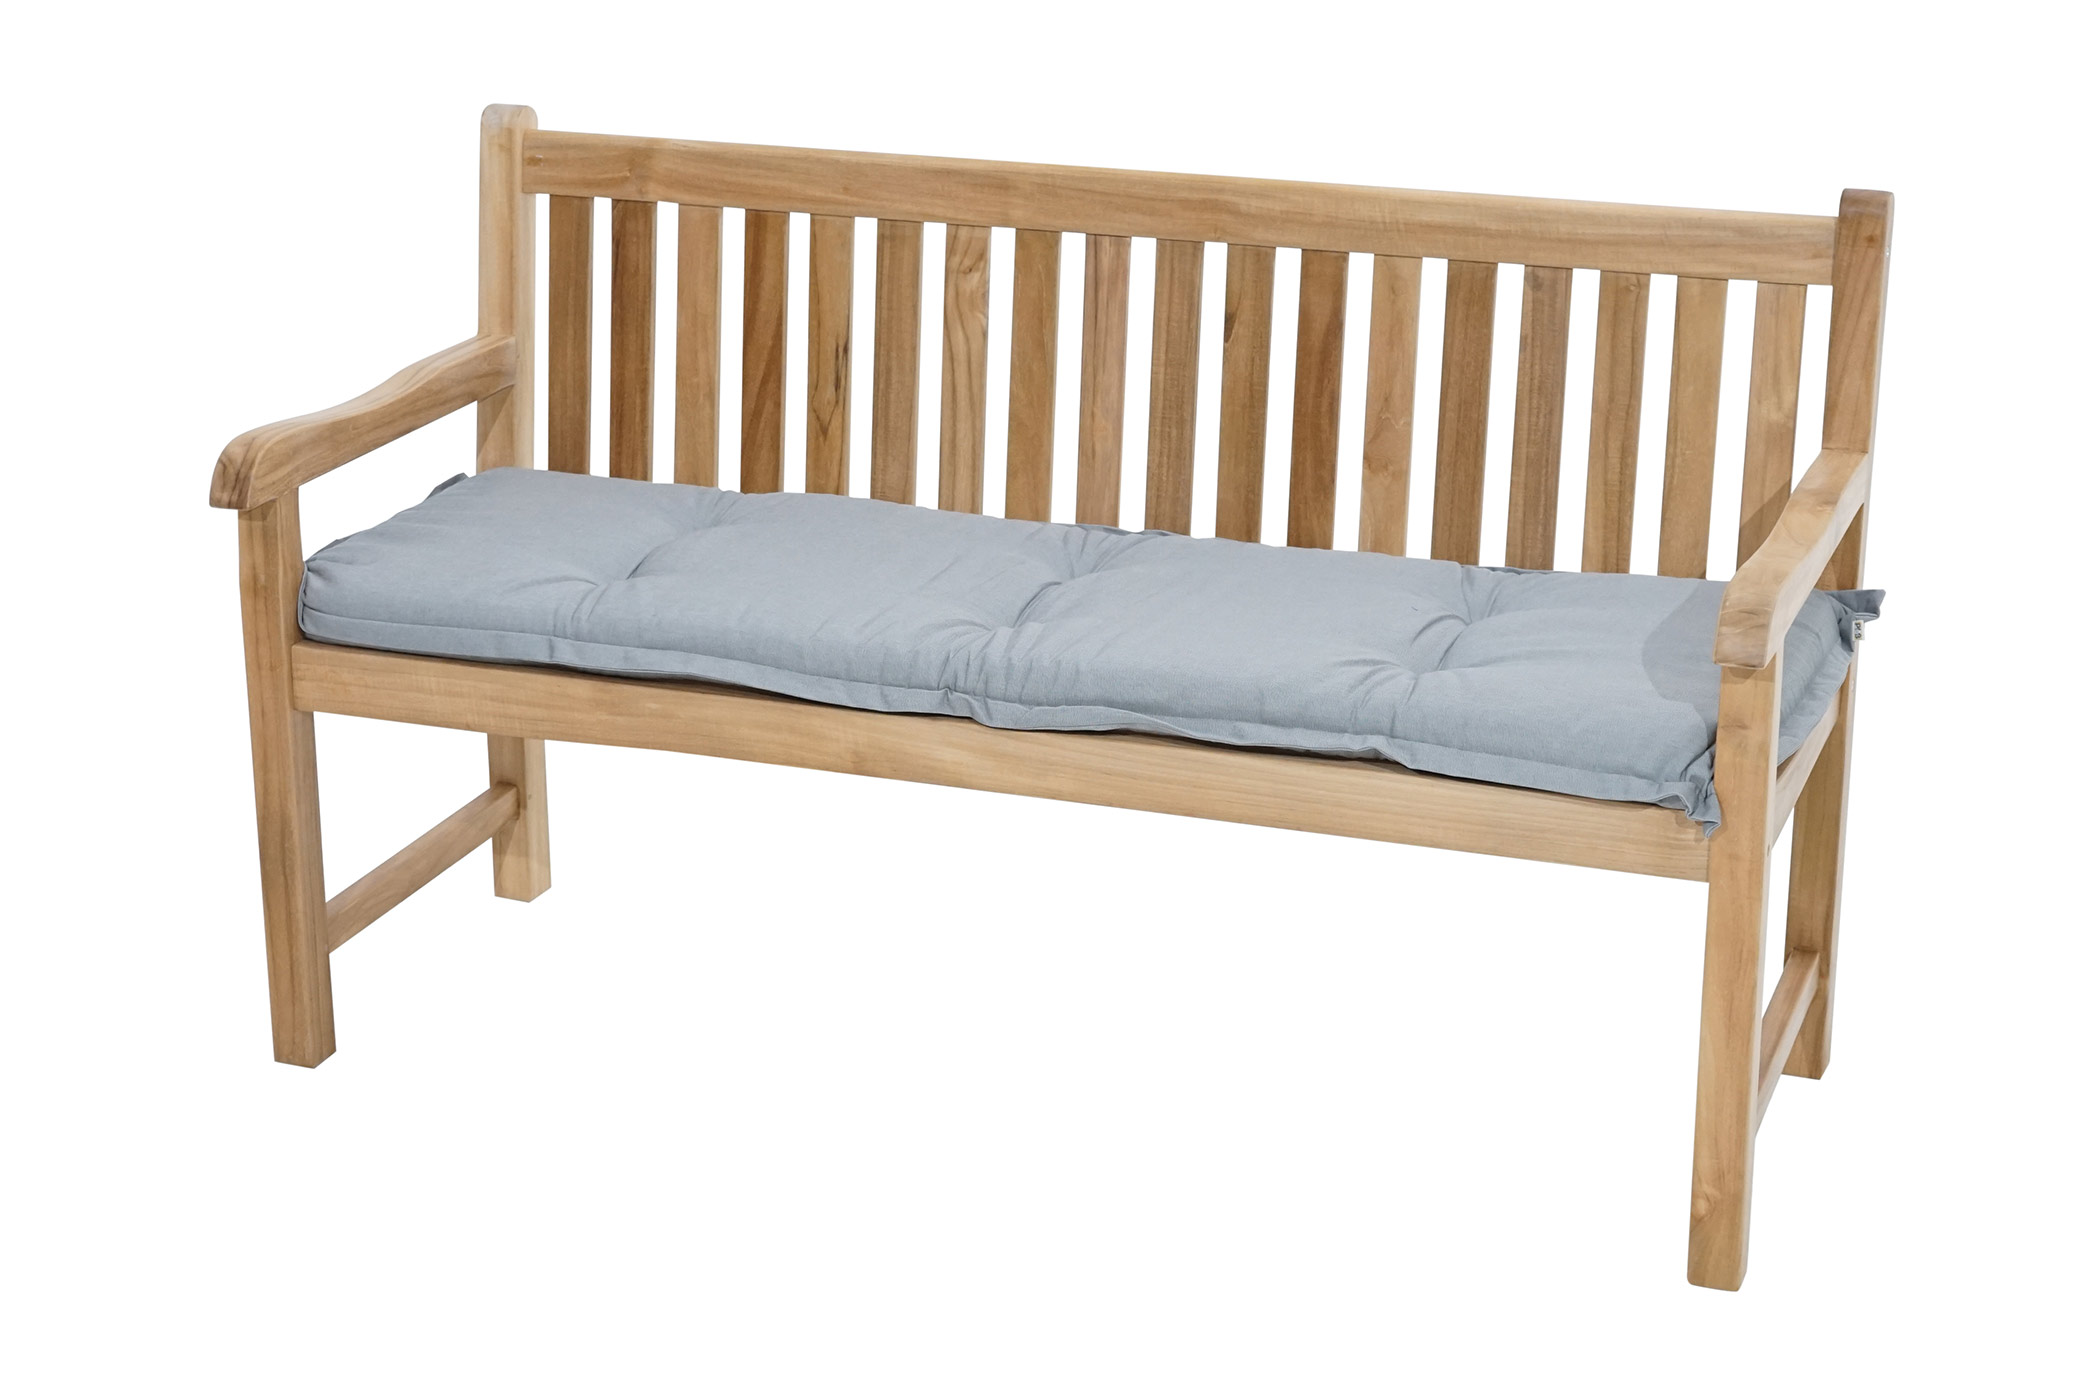 premiumpolster sydney 150 cm bank 150cm polster f r b nke plaids auflagen gardanio. Black Bedroom Furniture Sets. Home Design Ideas